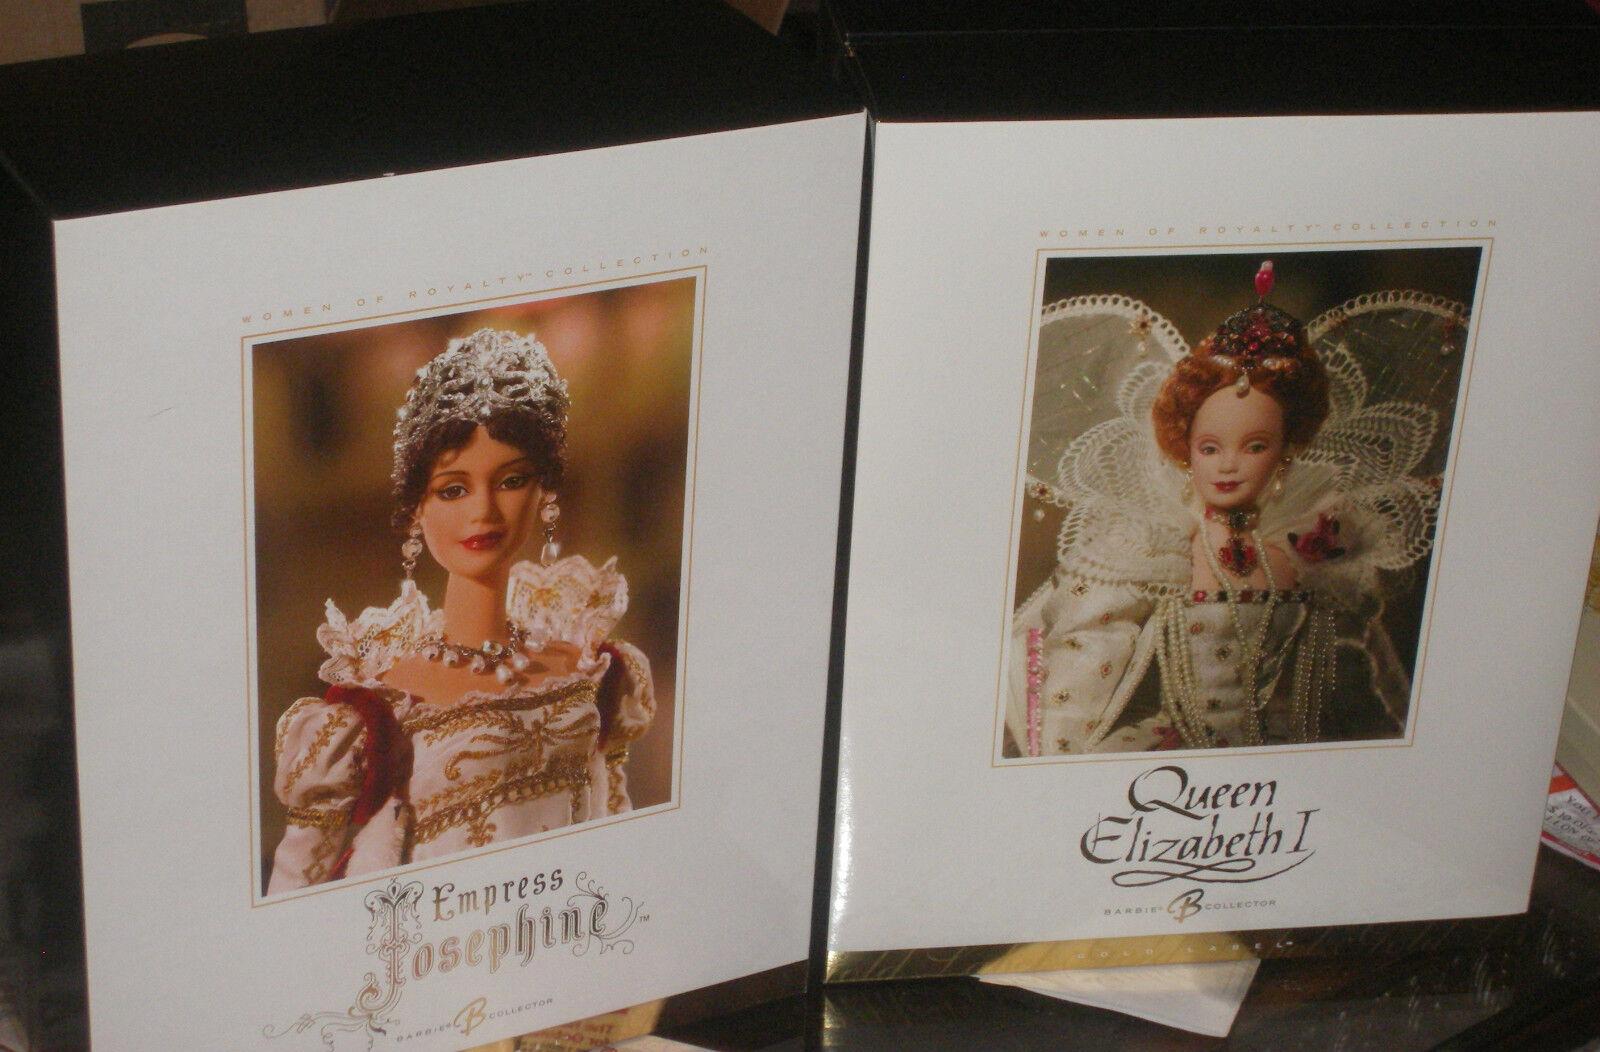 En caja original Empress Josephine Barbie en caja original con difícil de encontrar la reina Isabel